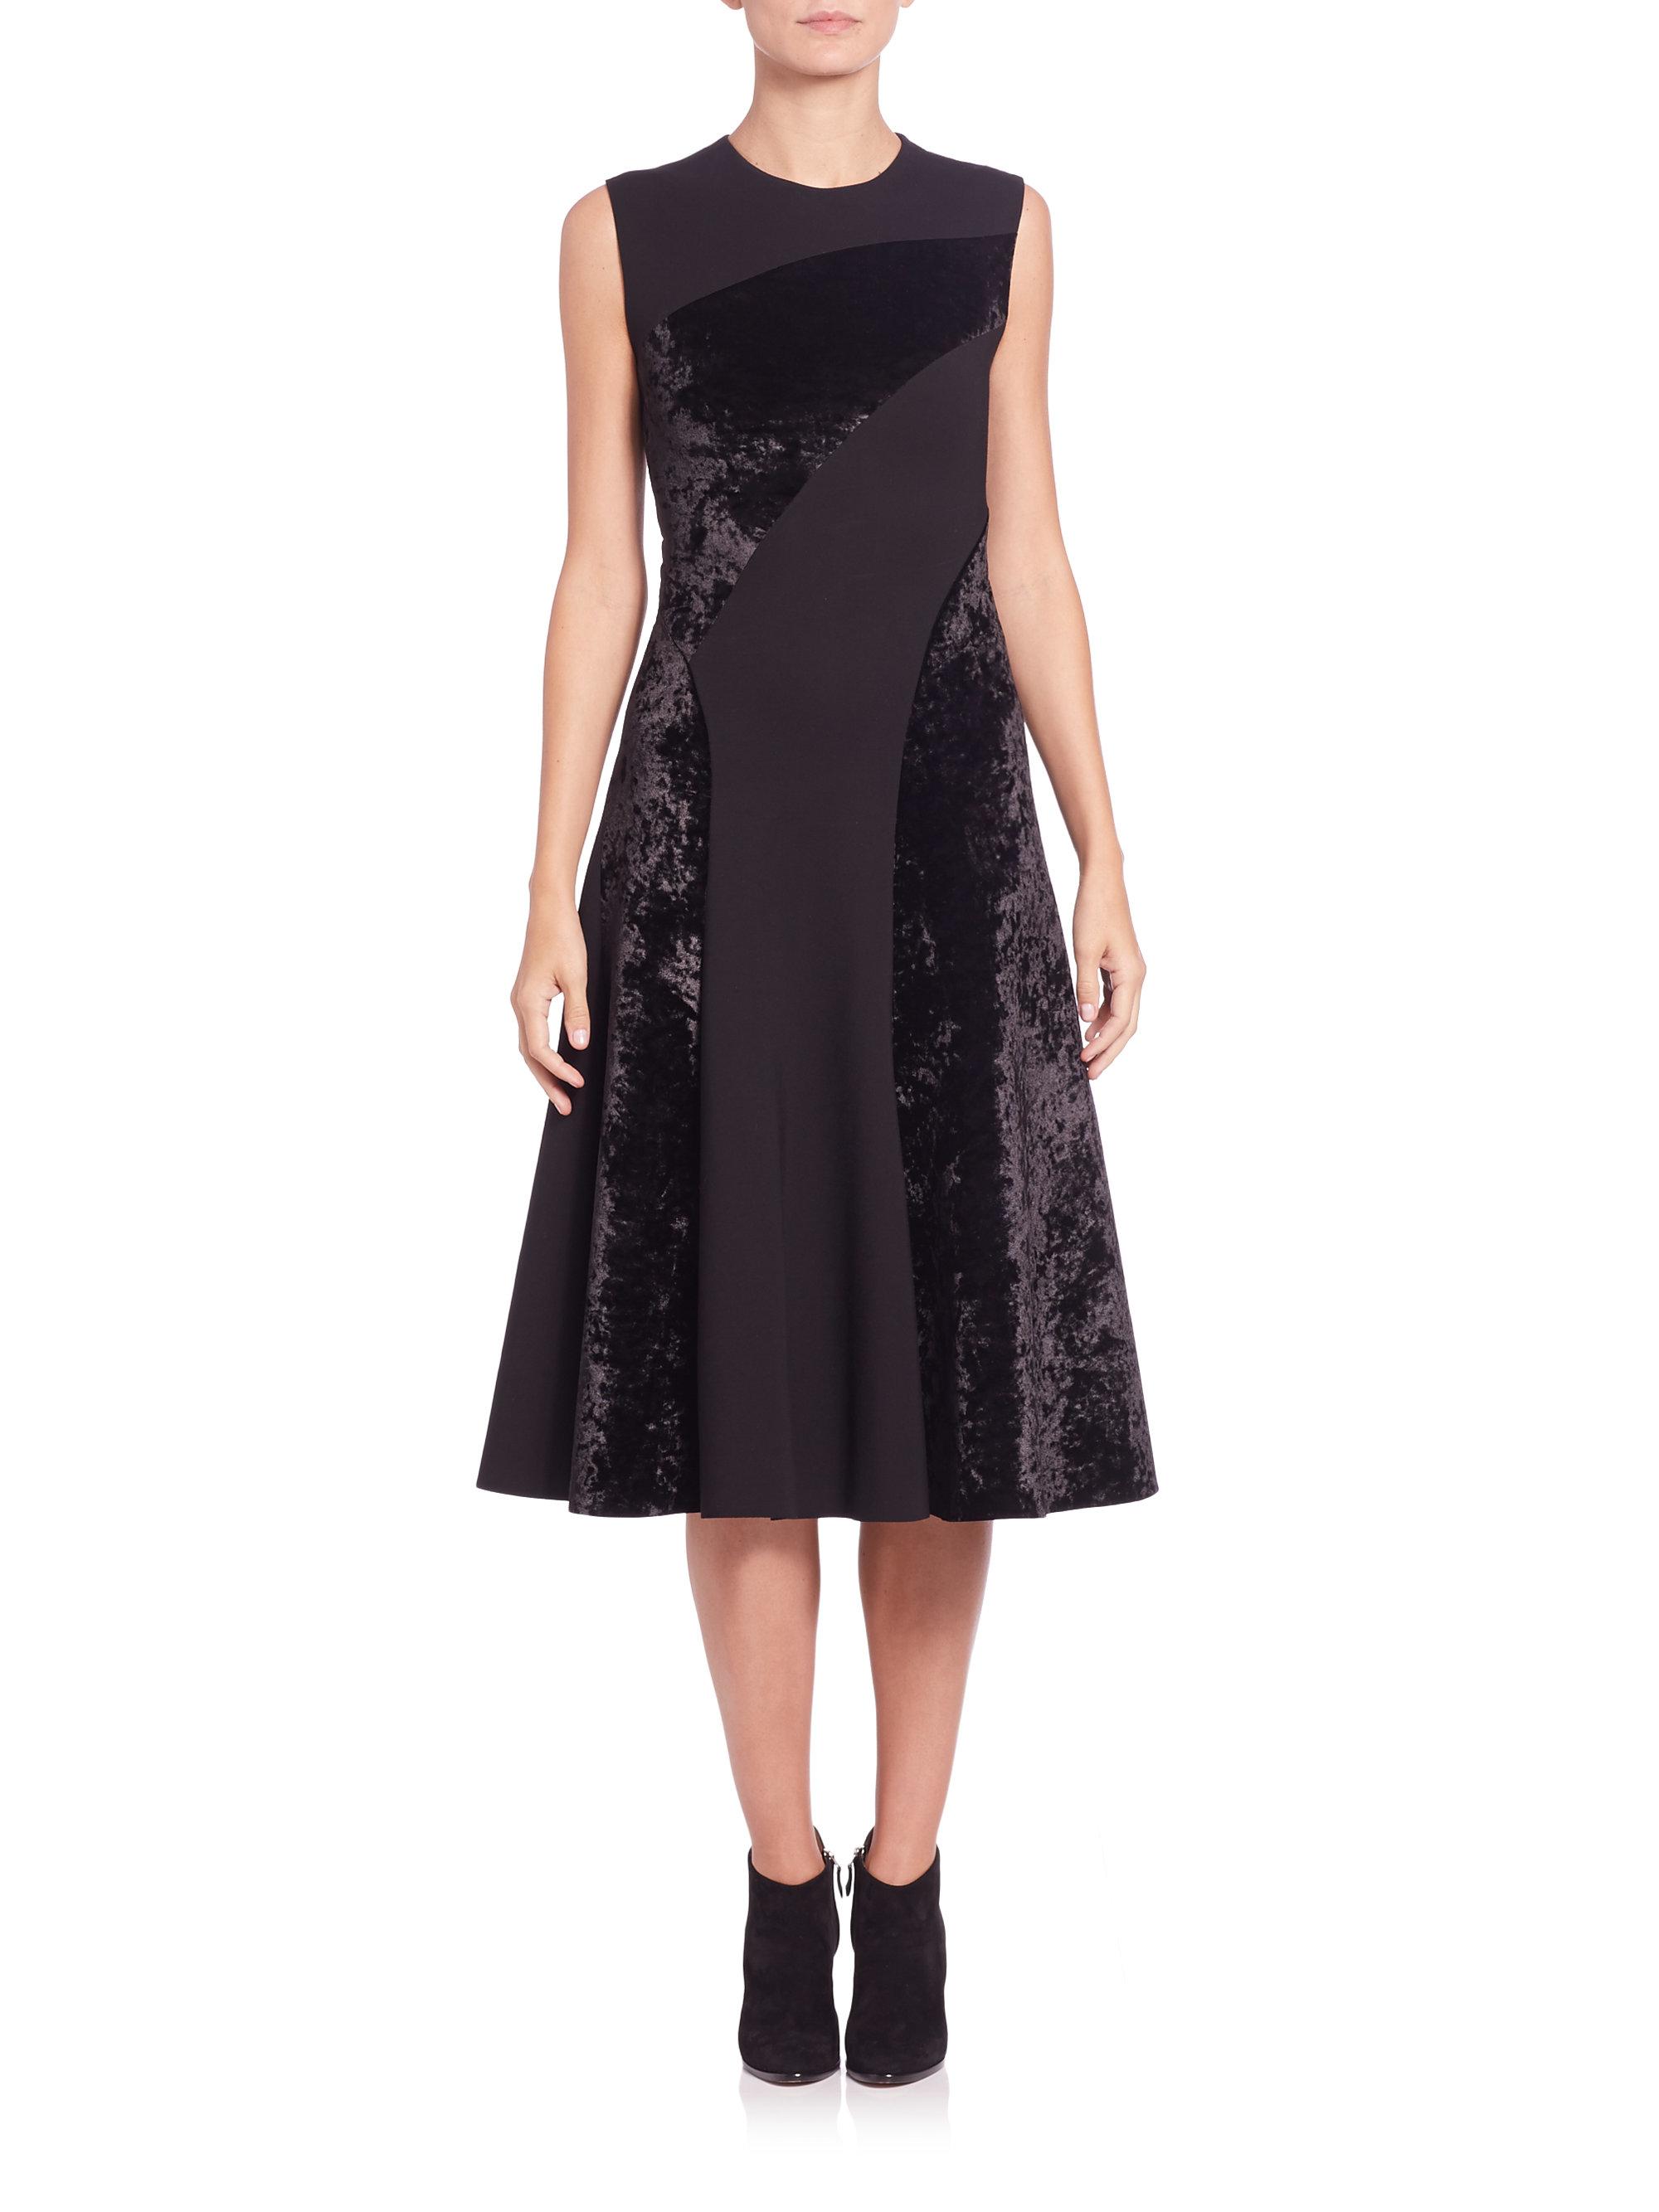 Dkny Black Cocktail Dresses